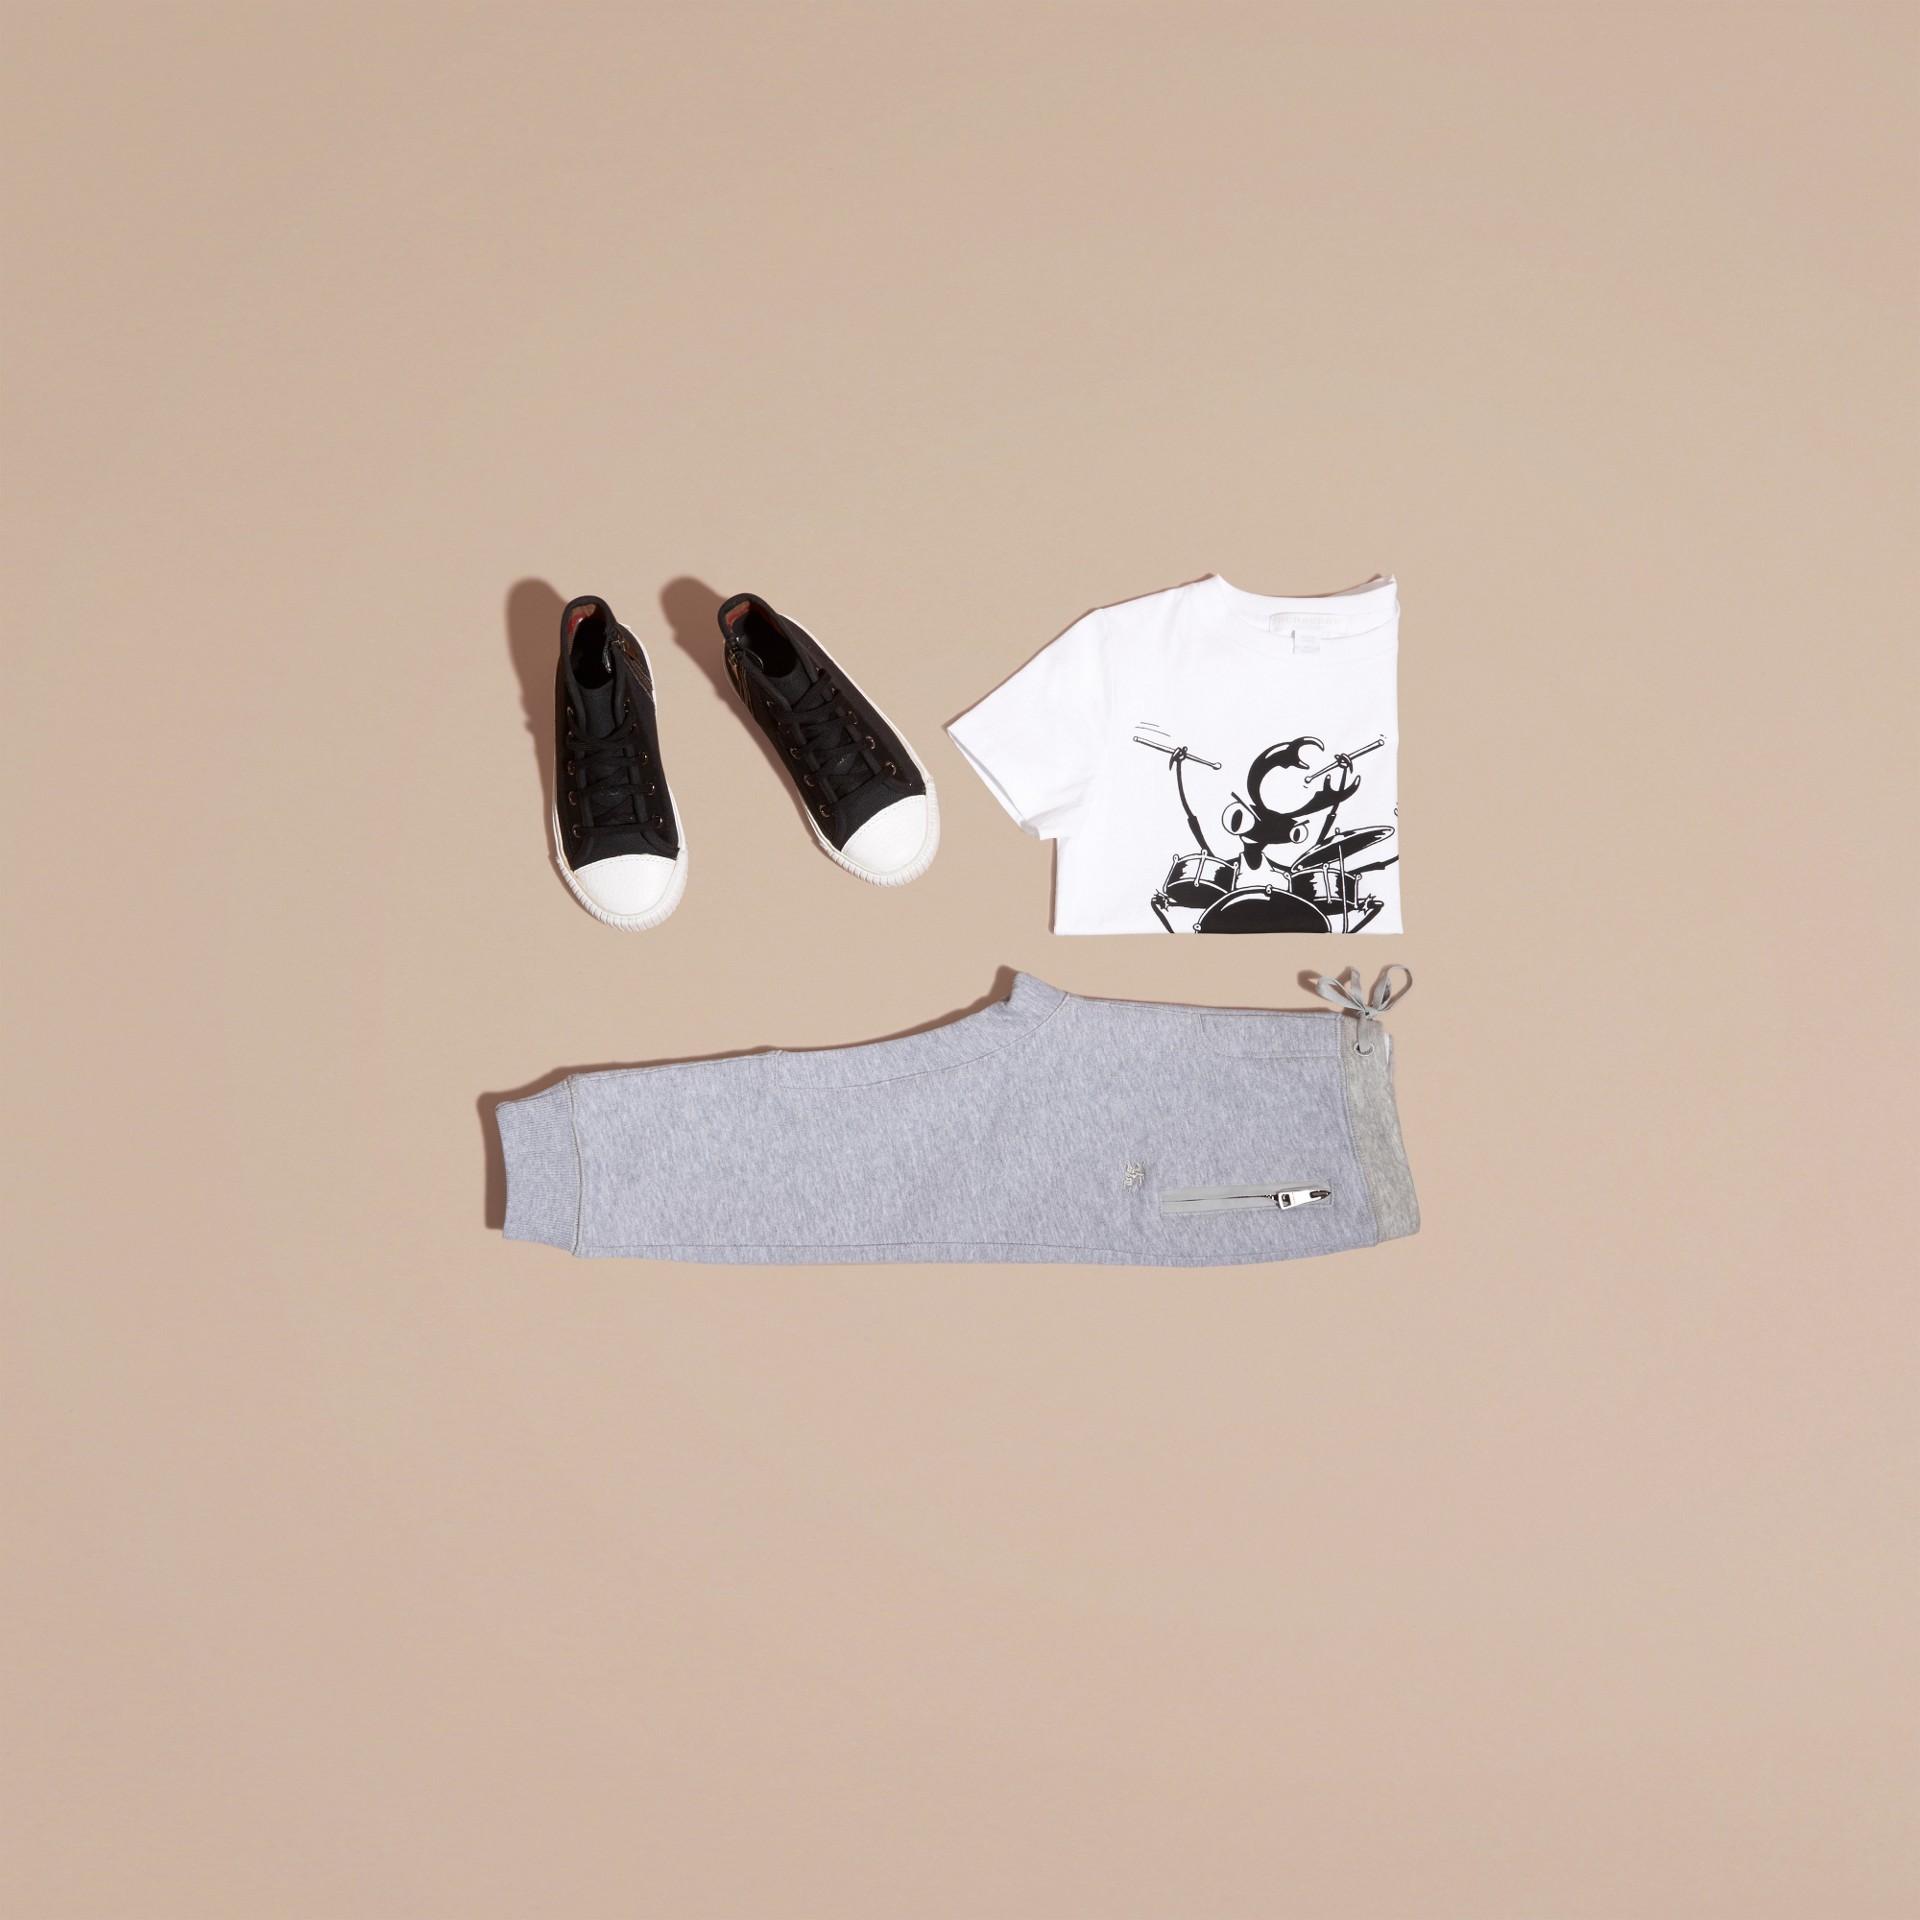 Camaïeu de gris moyens Pantalon de survêtement en coton Camaïeu  Gris Moyens - photo de la galerie 5